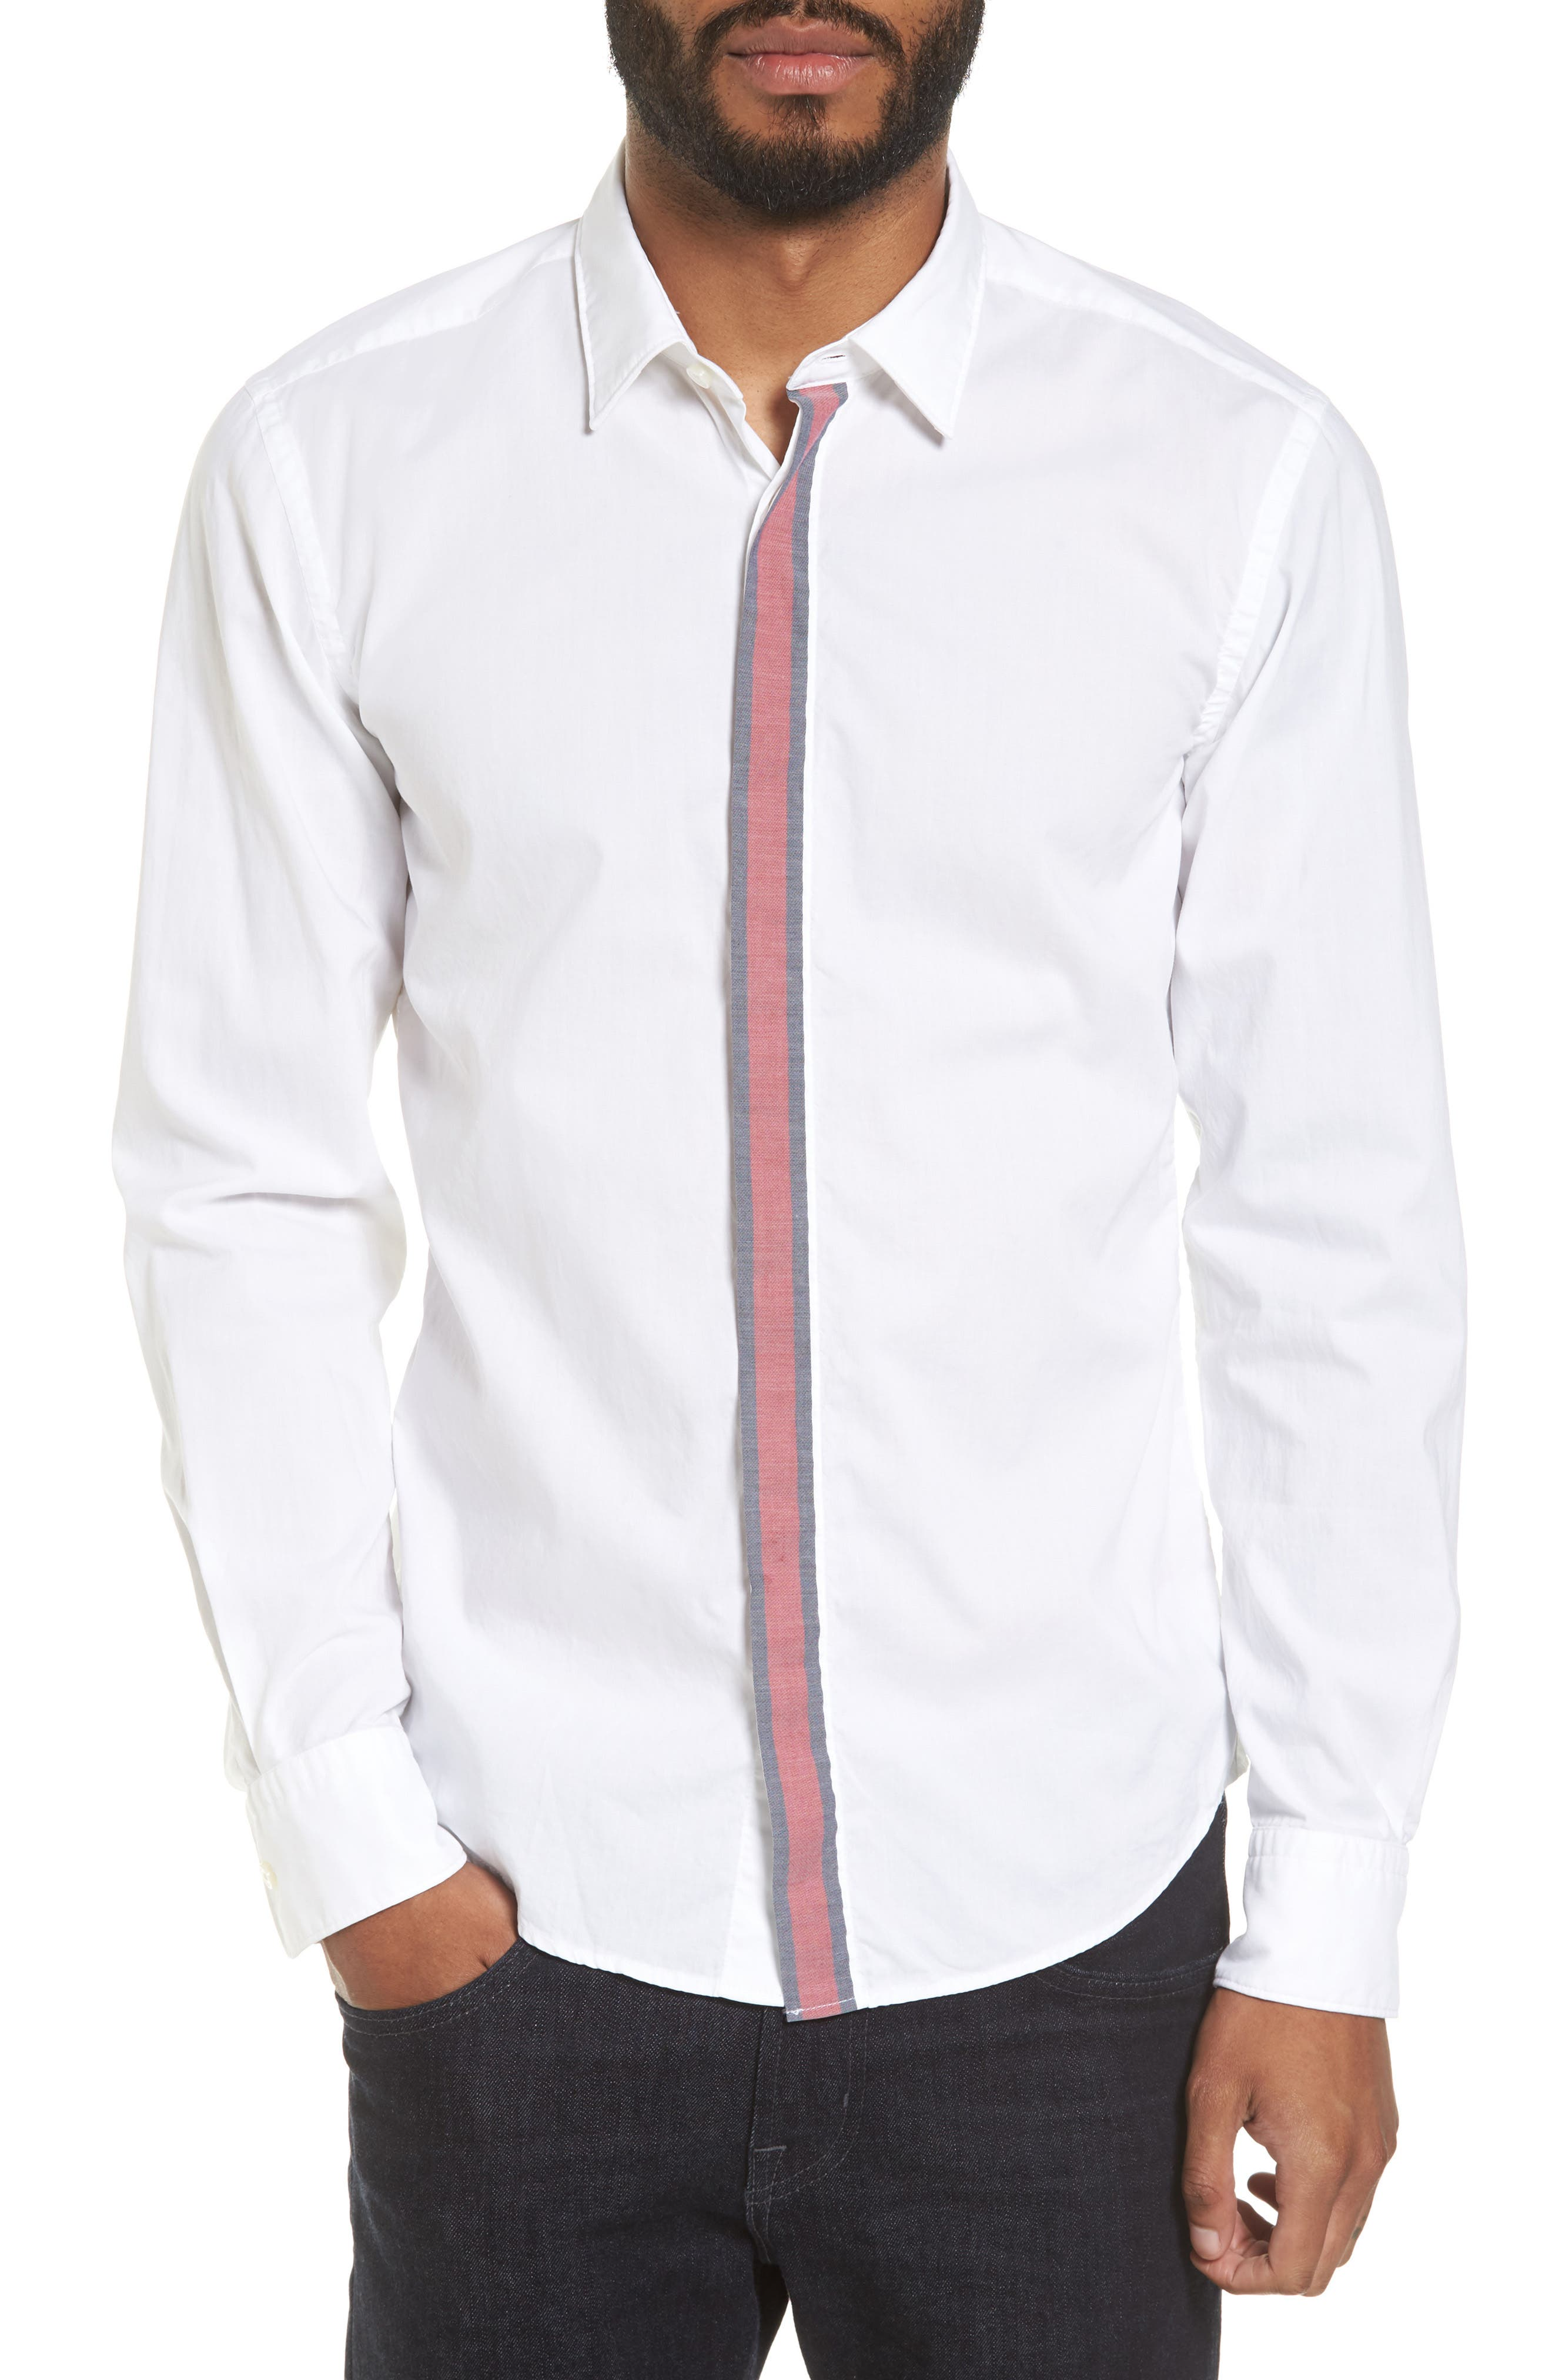 Alternate Image 1 Selected - BOSS Reid Slim Fit Contrast Placket Sport Shirt